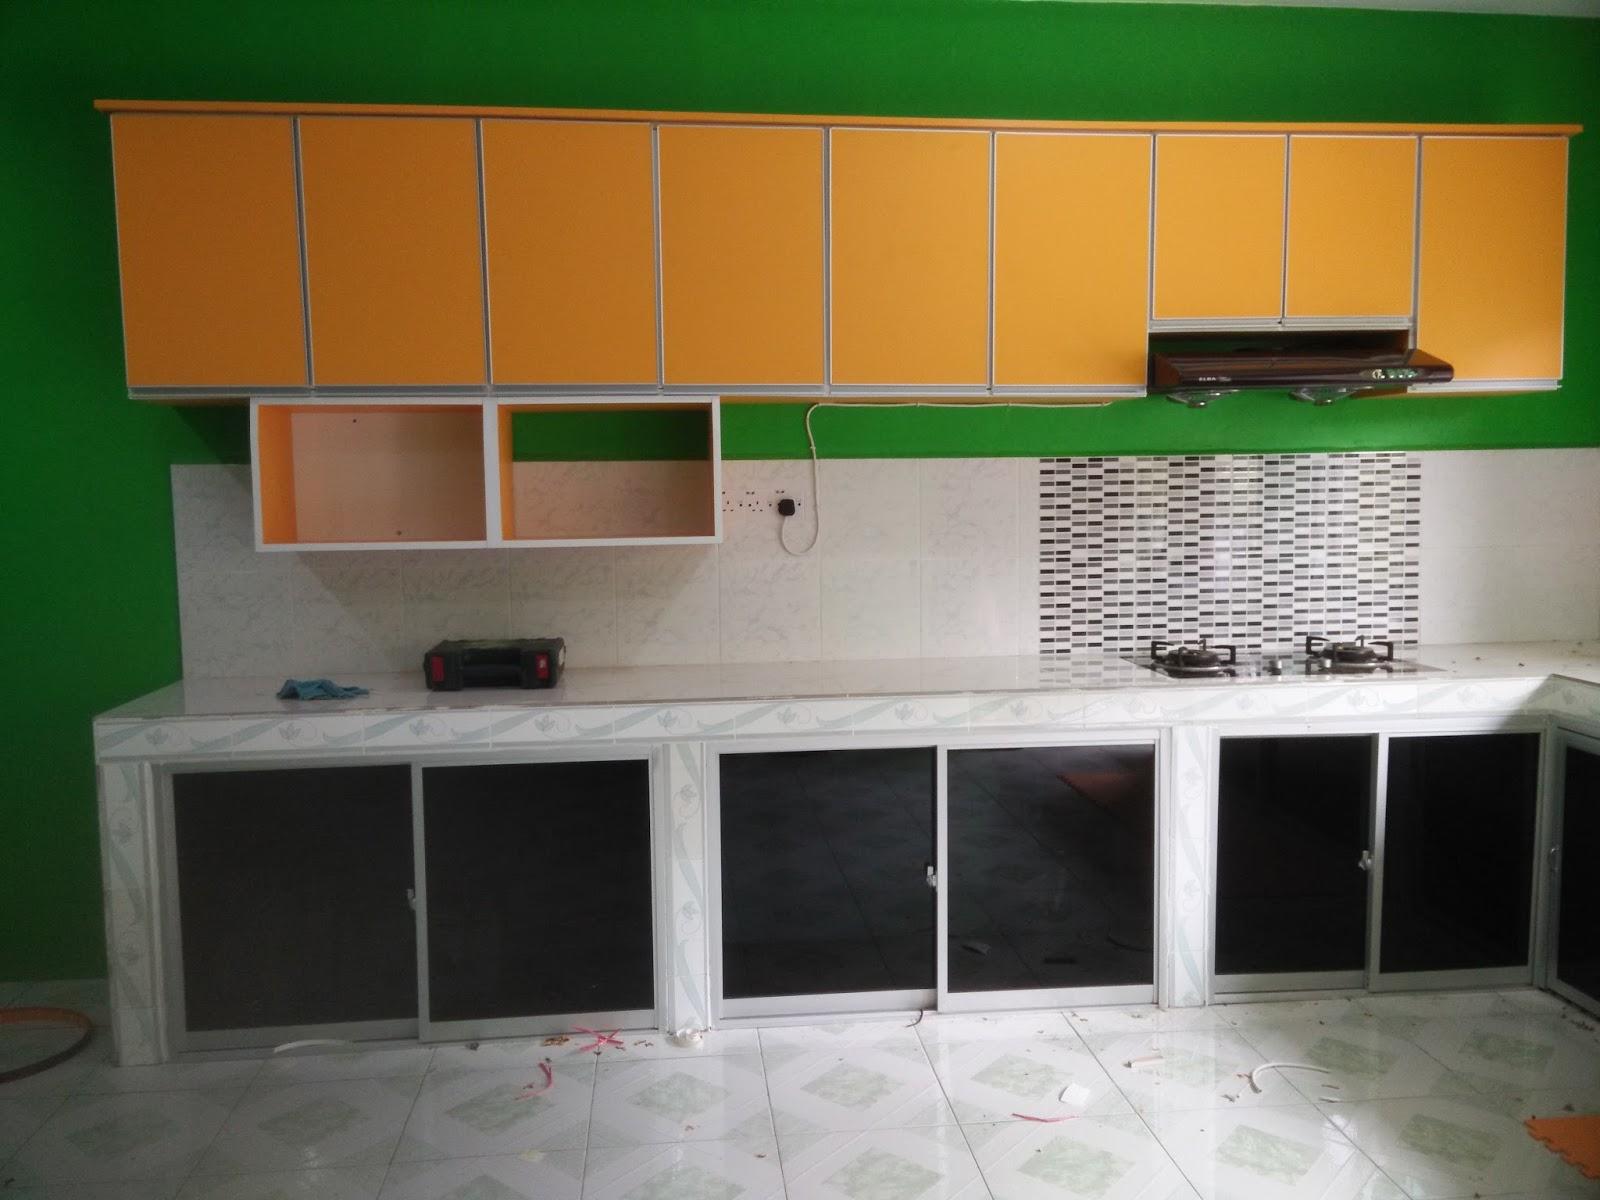 Membuat Kabinet Dapur Dan Lain Yang Berasaskan Kayu Di Kuching Sarawak